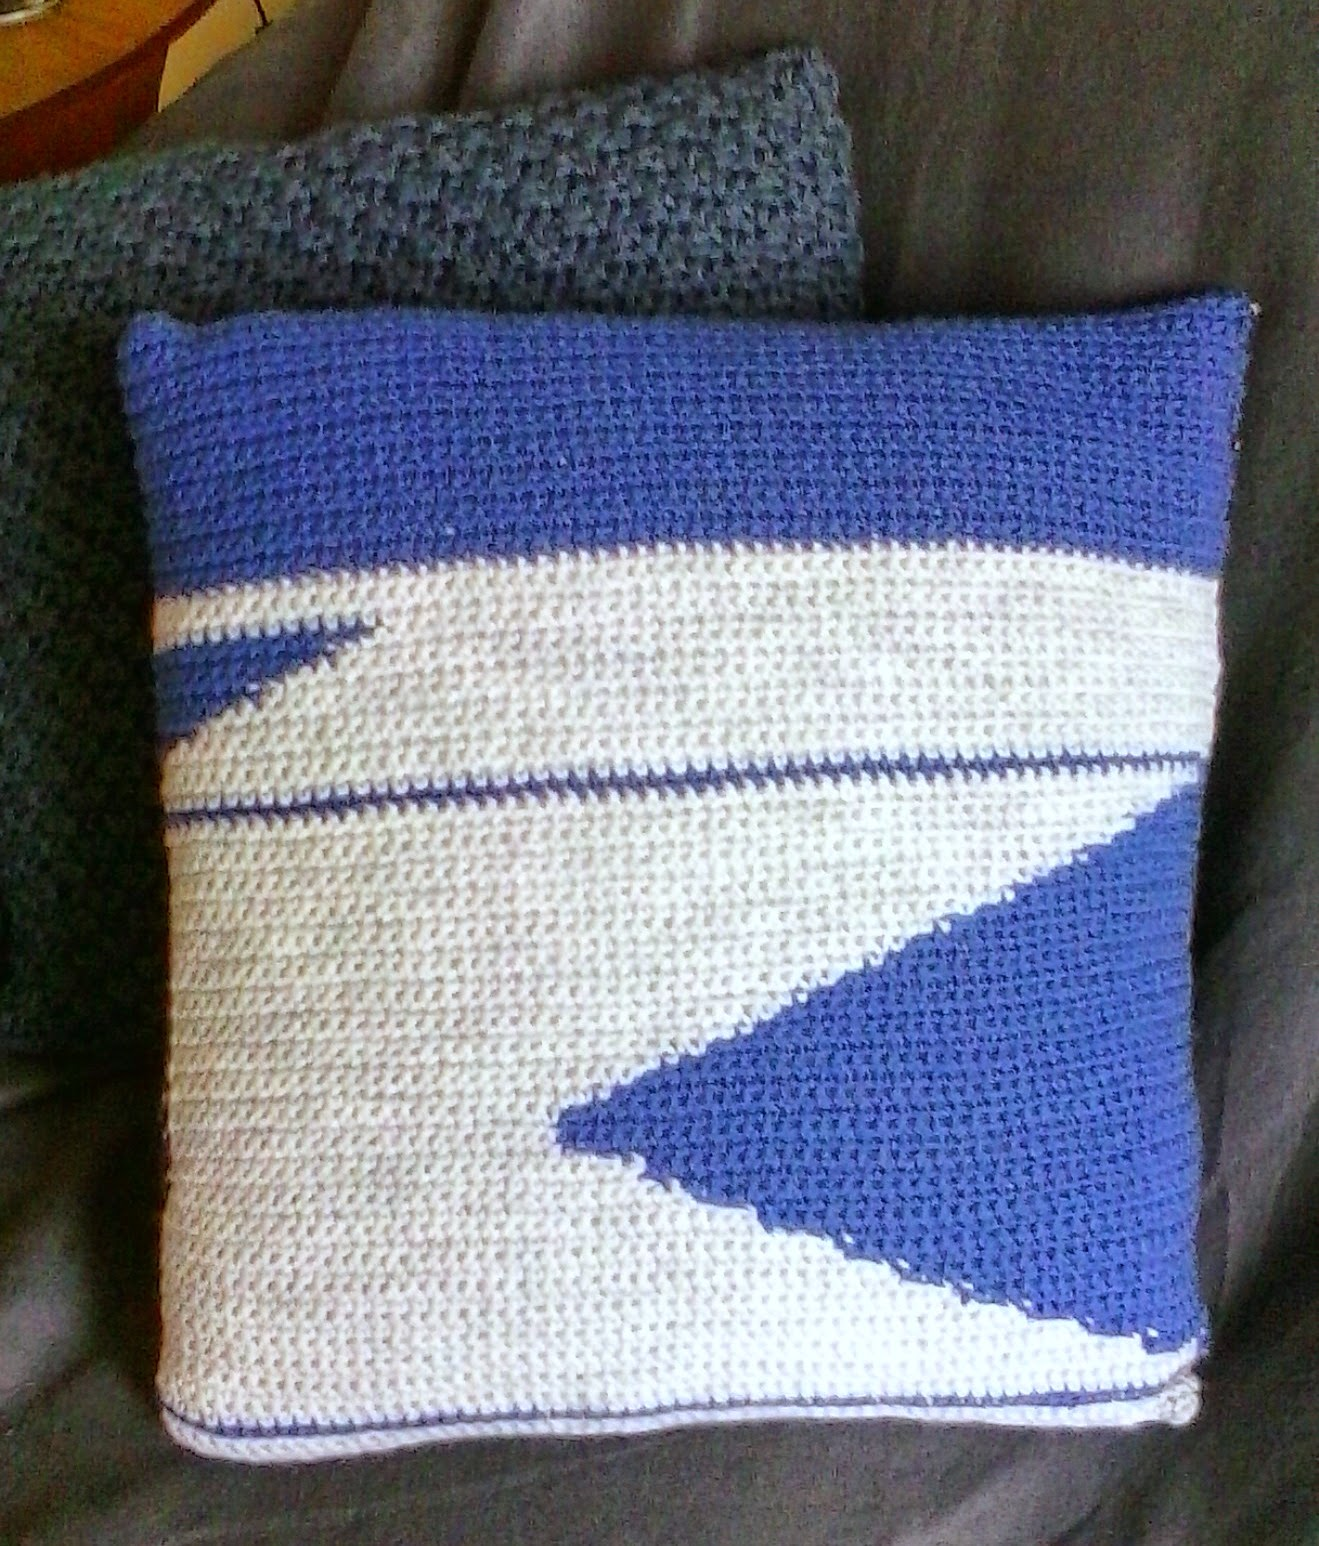 mademoiselle a coussin graphique au crochet bleu gris et tissu polka dot tuto. Black Bedroom Furniture Sets. Home Design Ideas